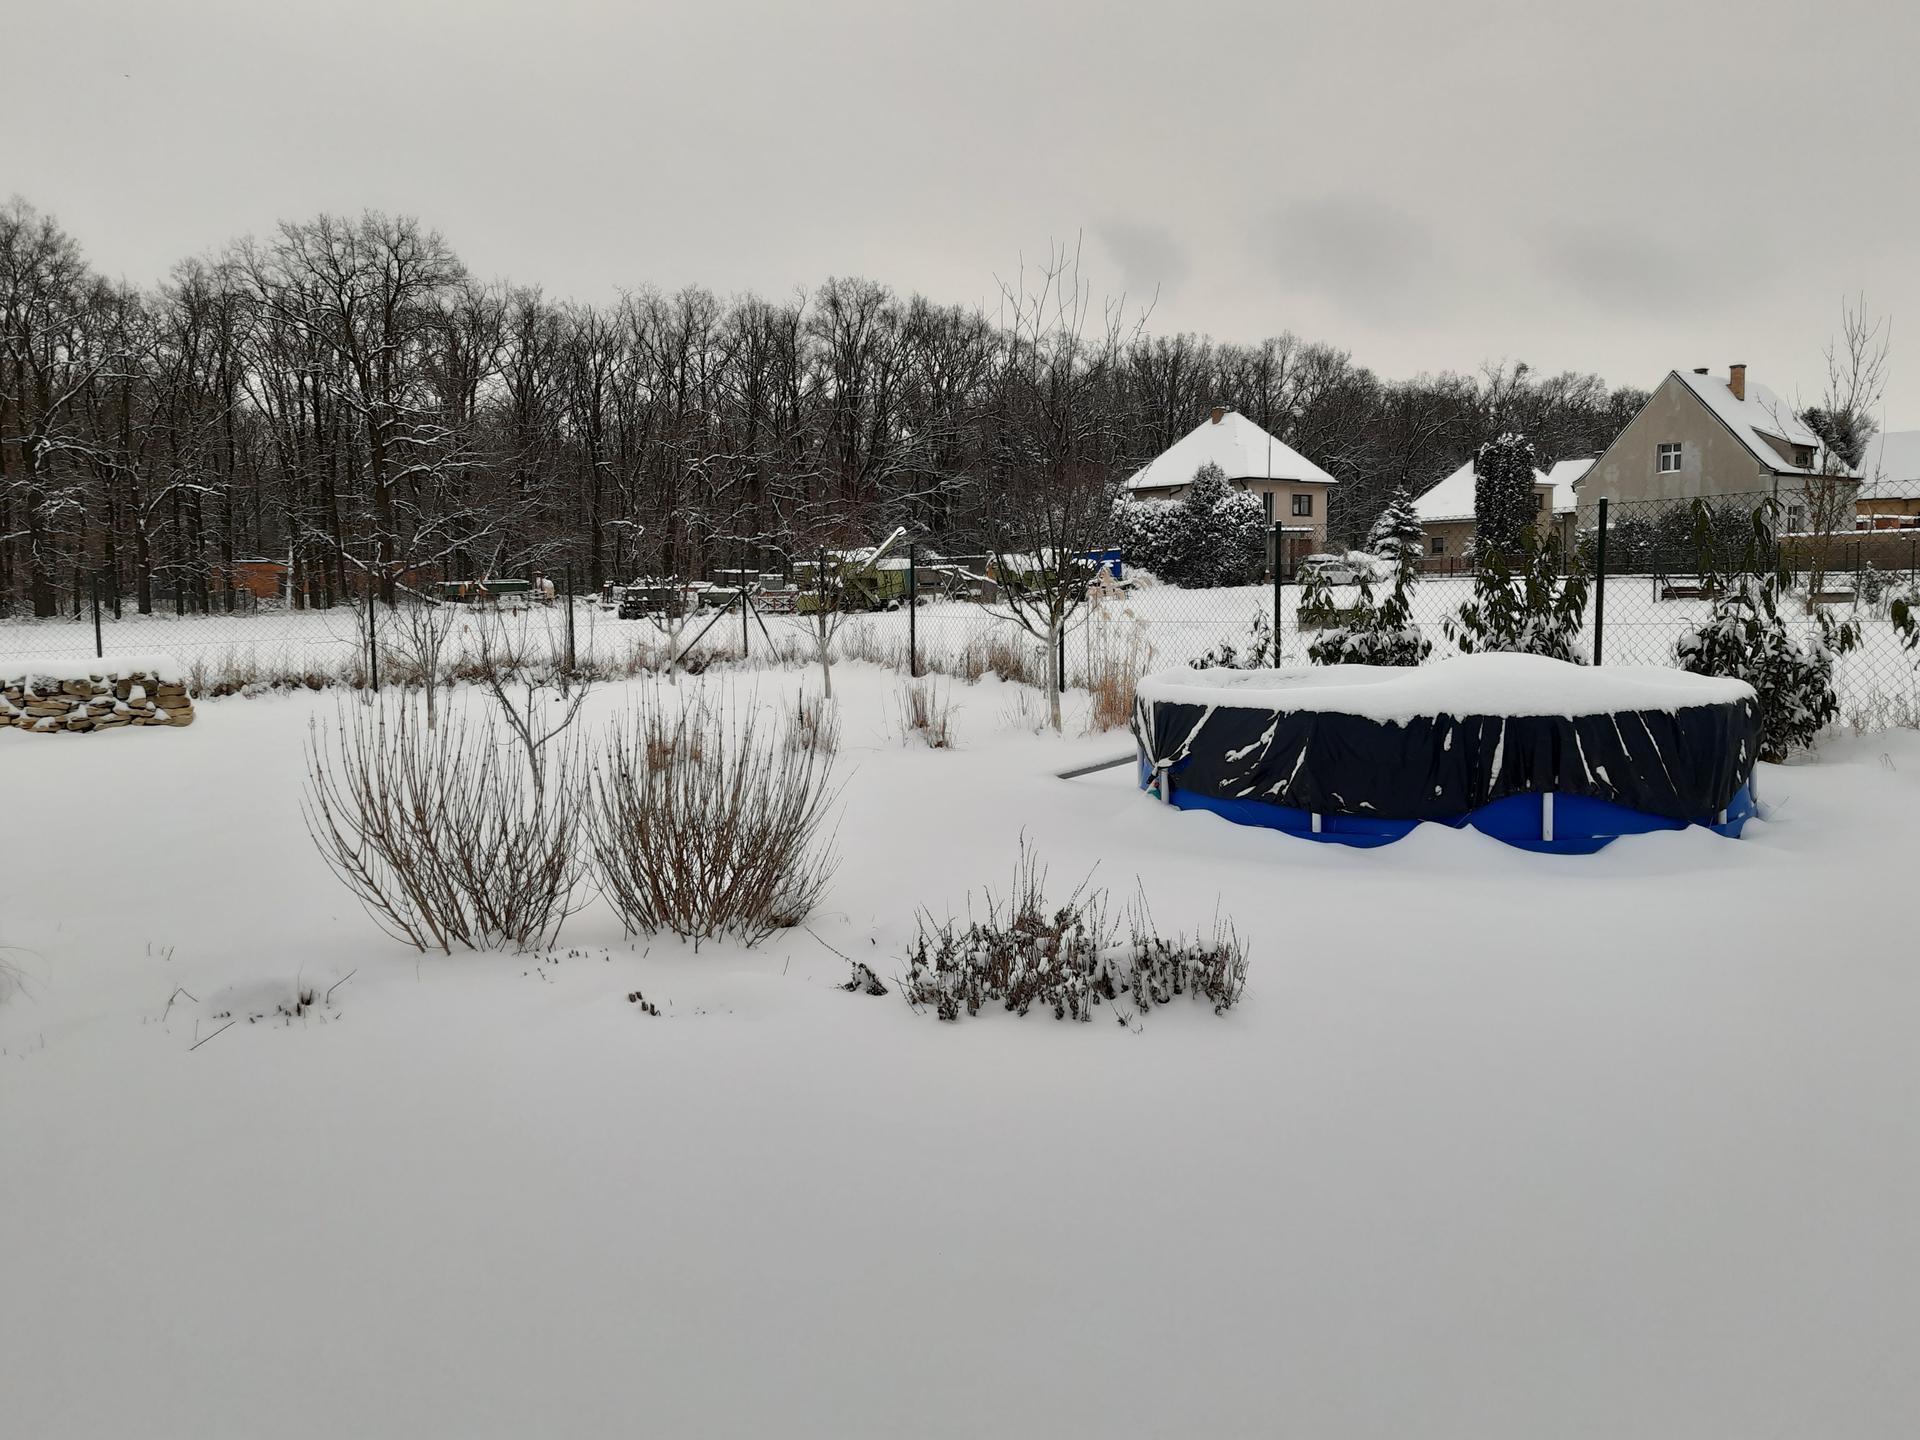 Zahrada 2021 - Obrázek č. 2